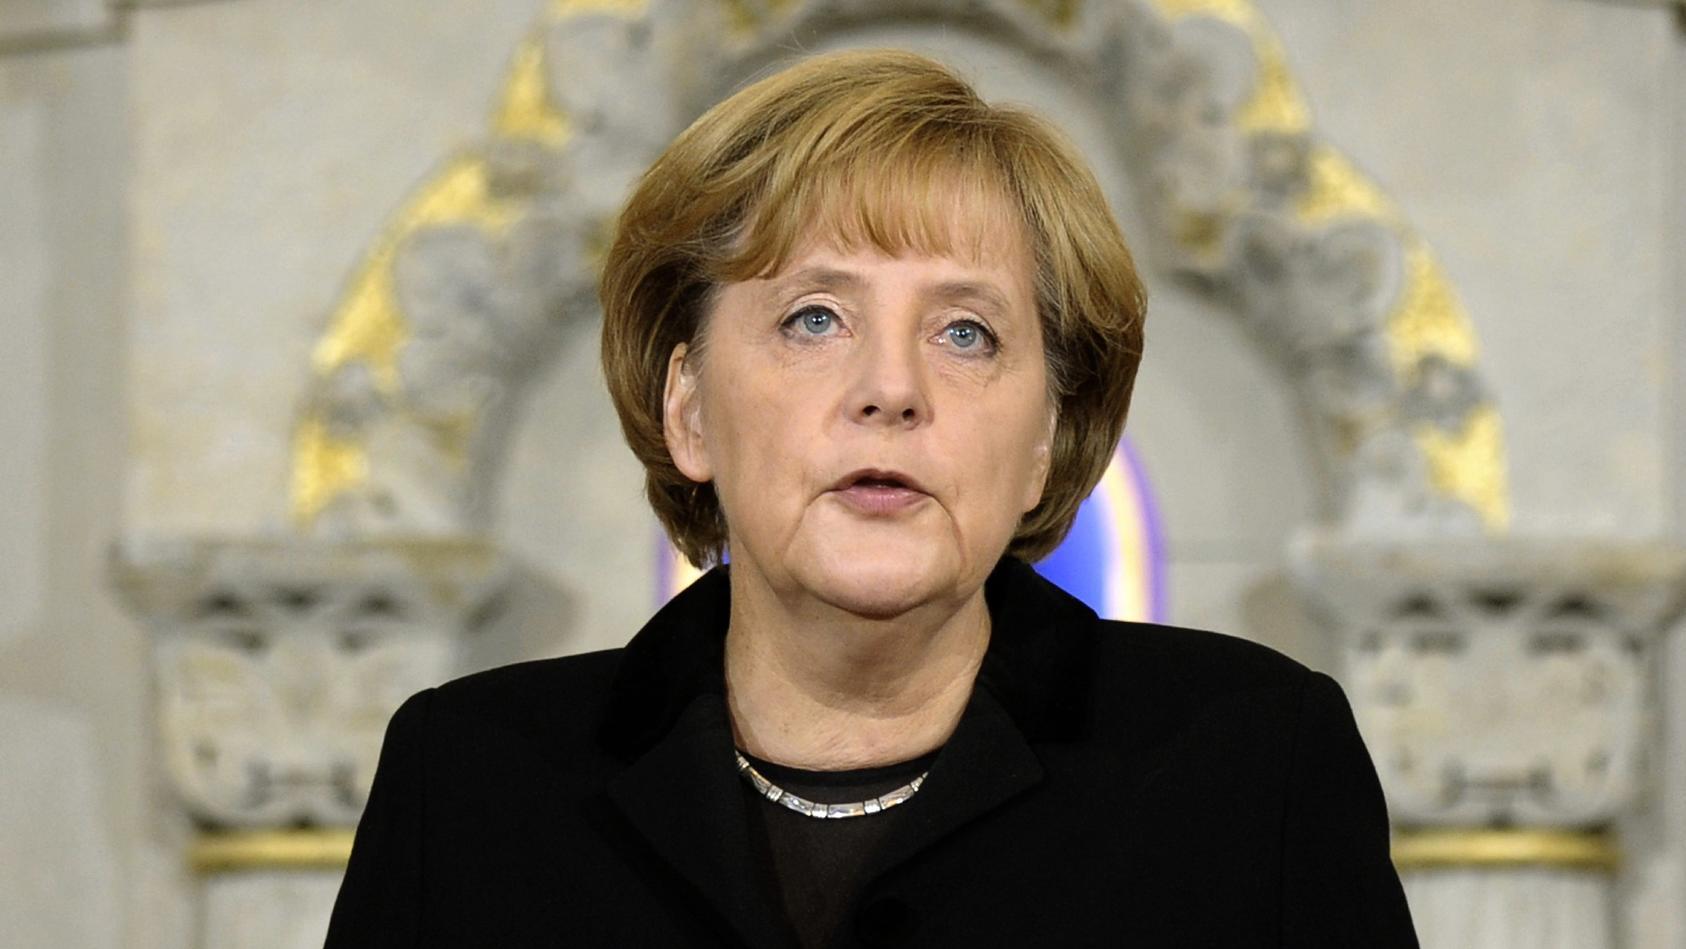 Merkel beklagt Antisemitismus in Deutschland.